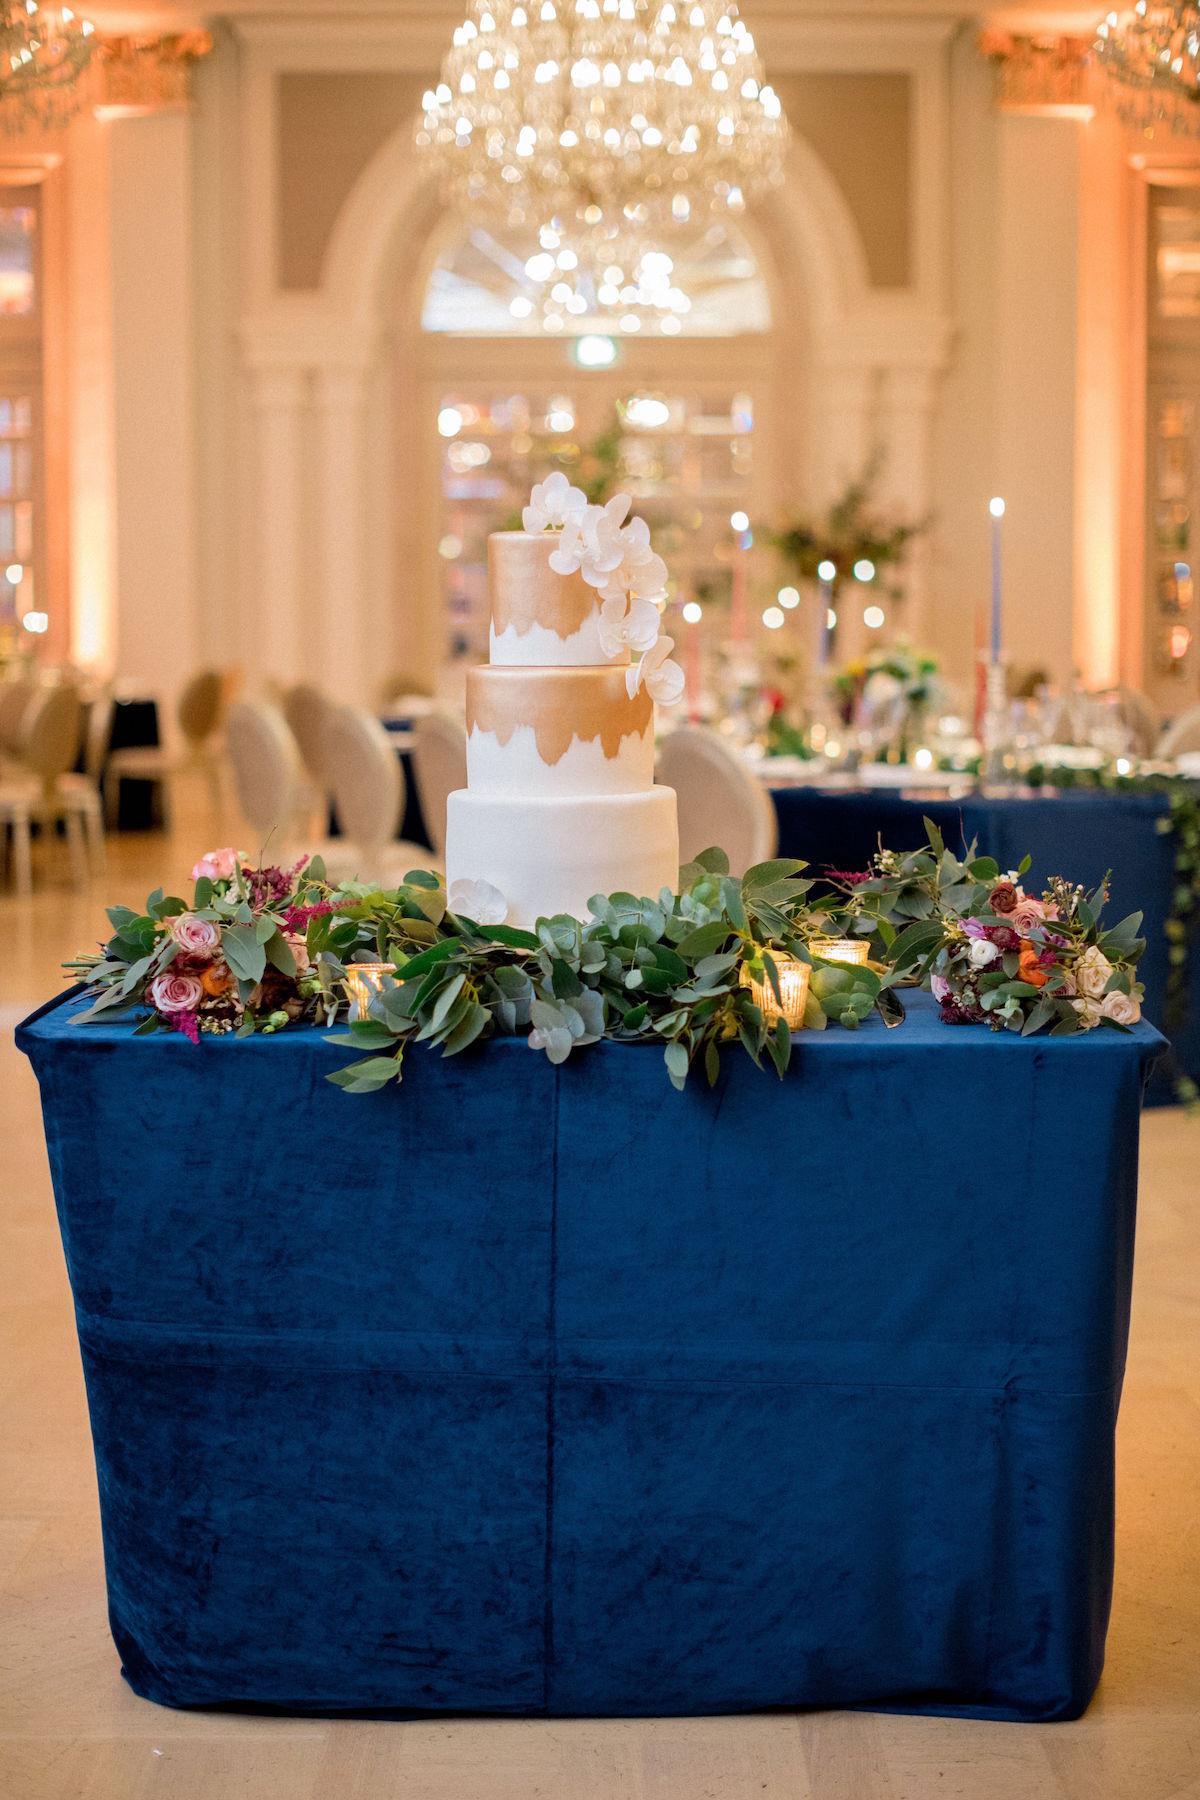 Adare Manor wedding gold tiered cake